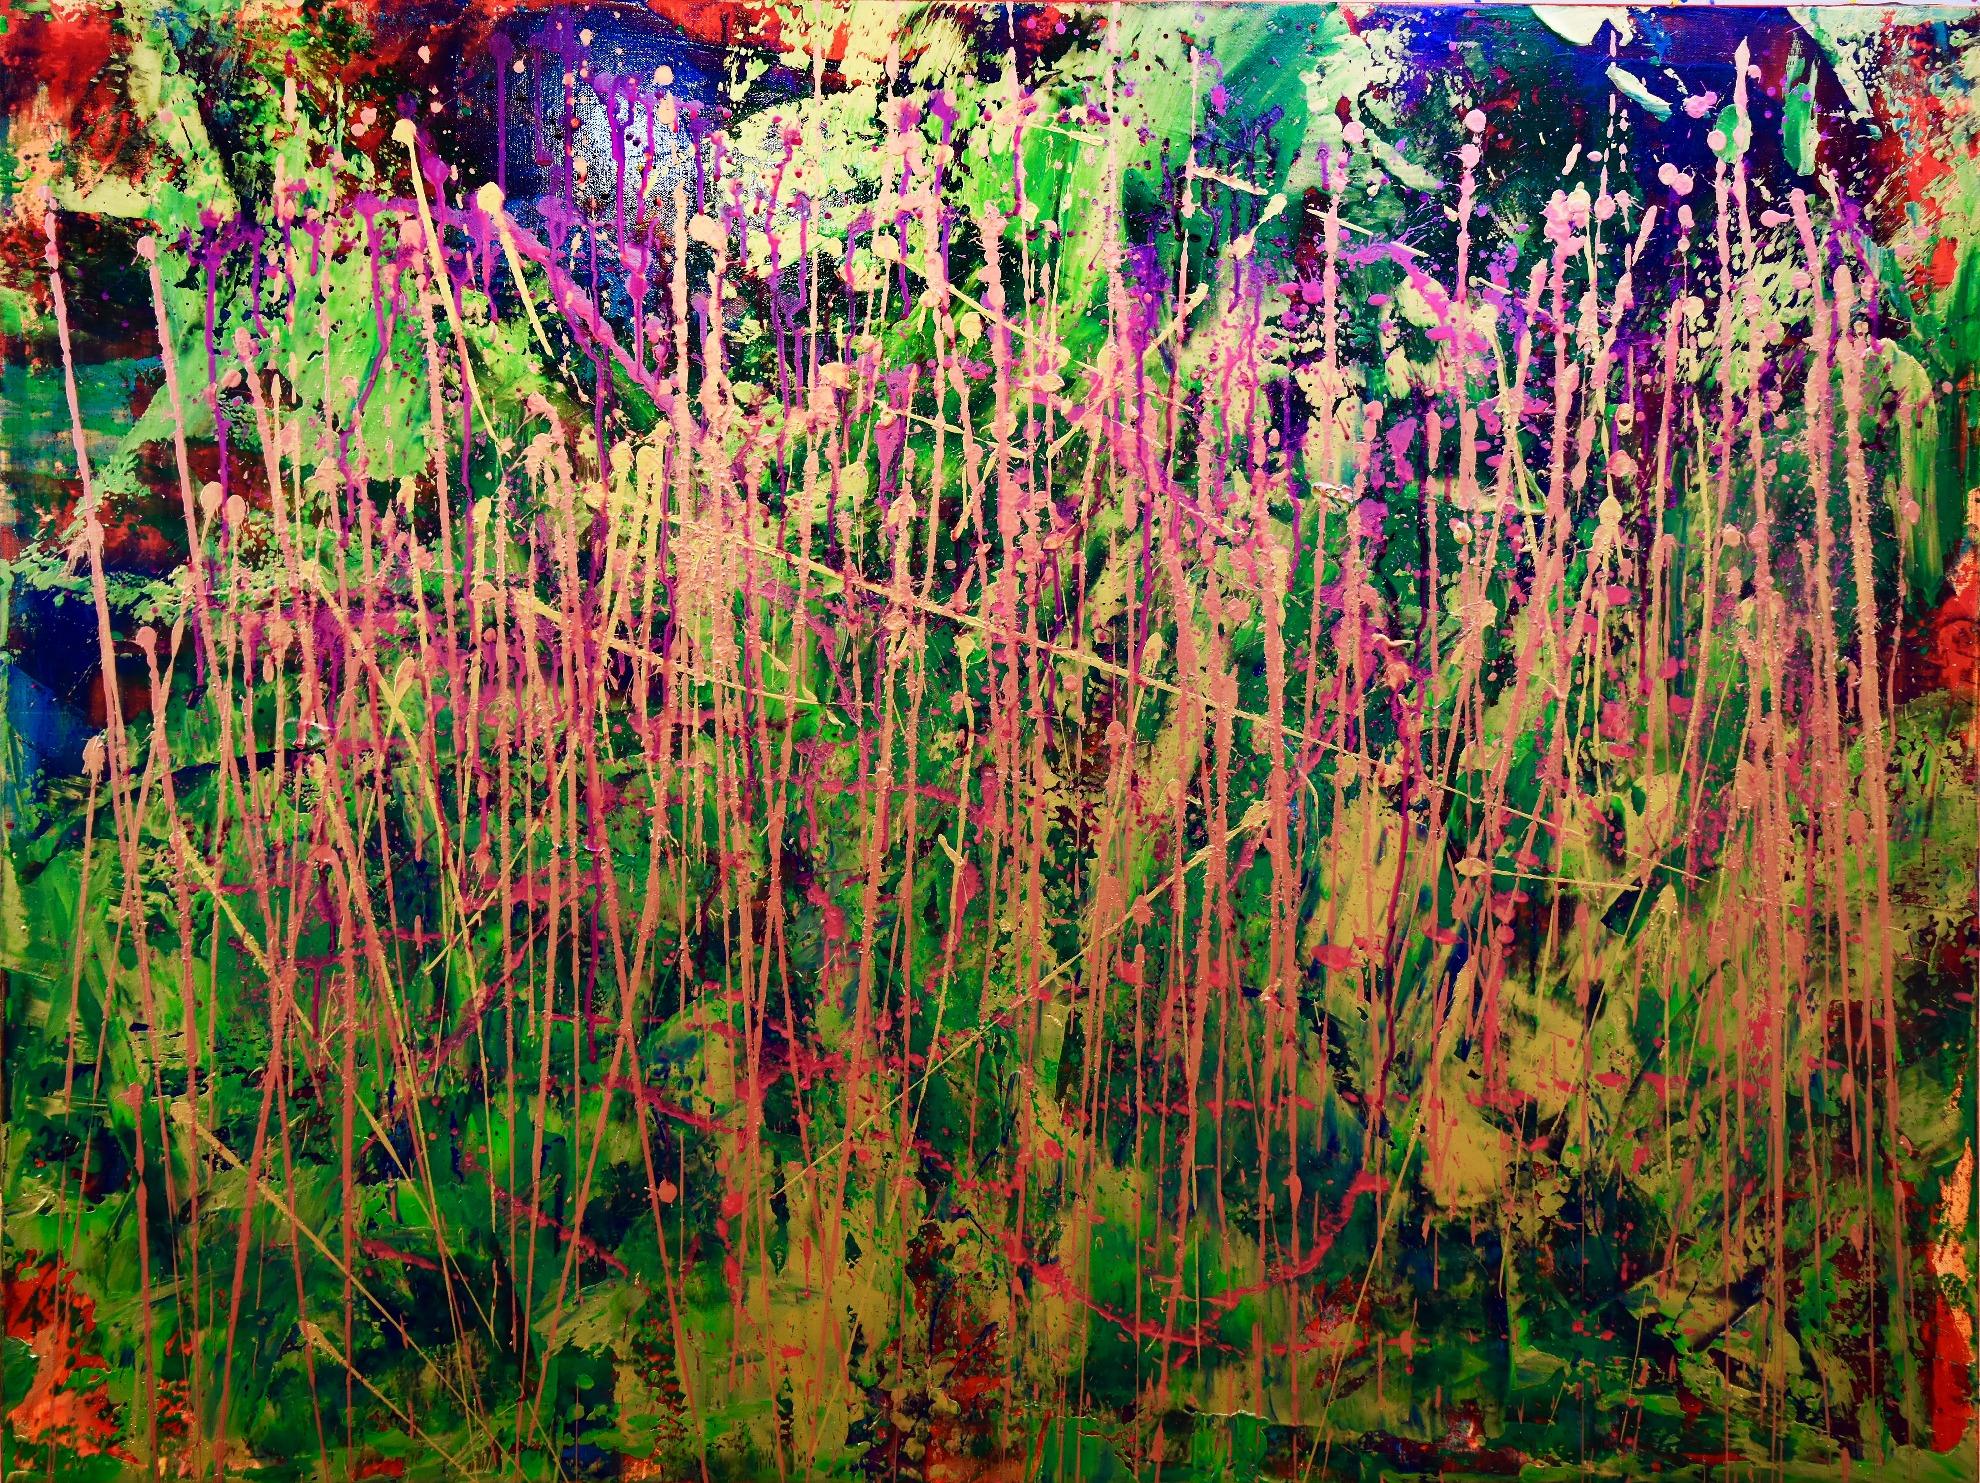 Golden Spectra by Nestor Toro in Los Angeles